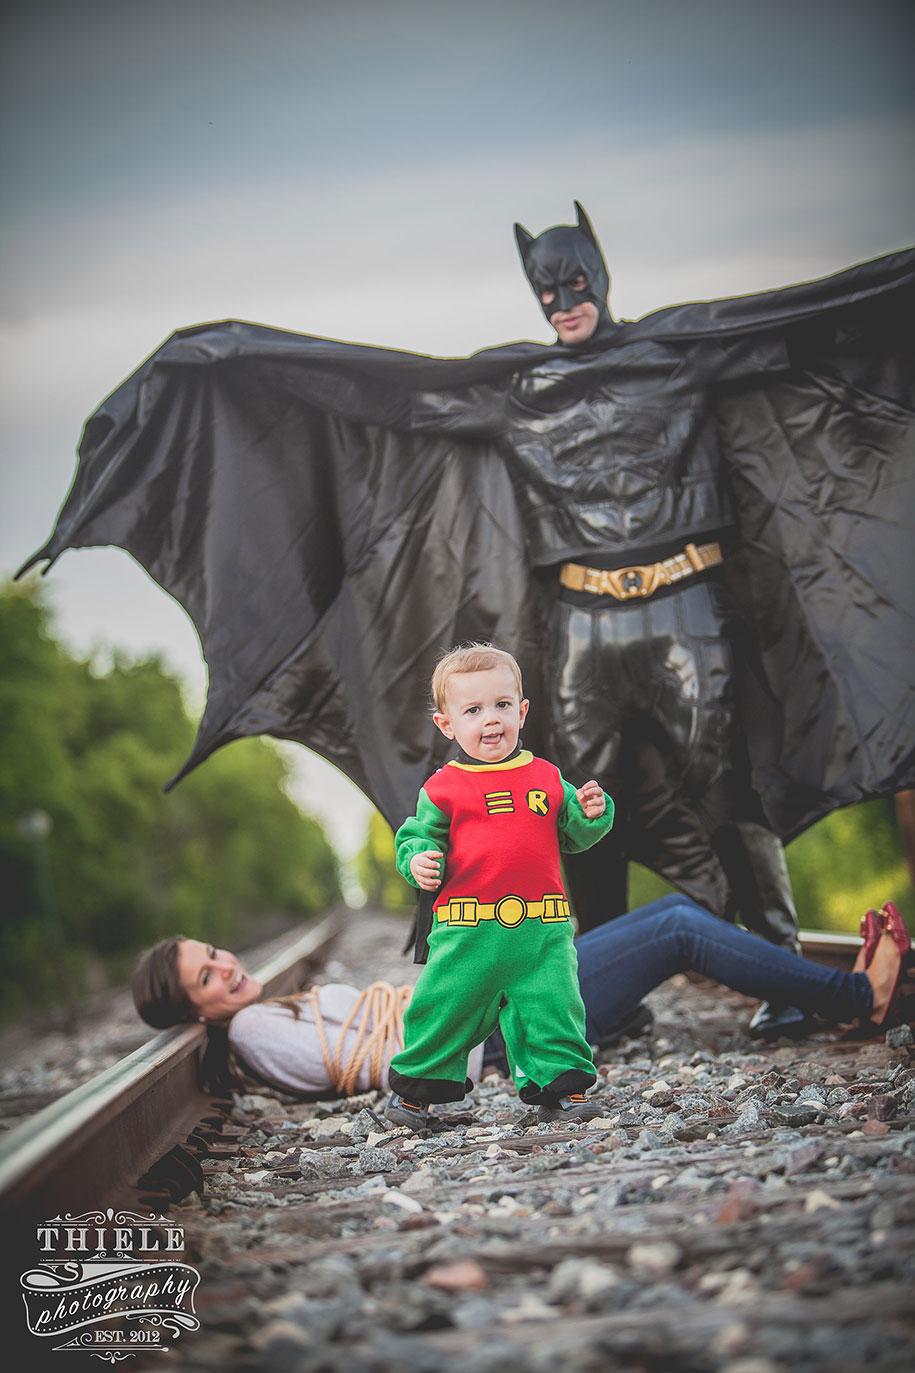 father-son-surprise-batman-robin-photoshoot-eric-thiele-13